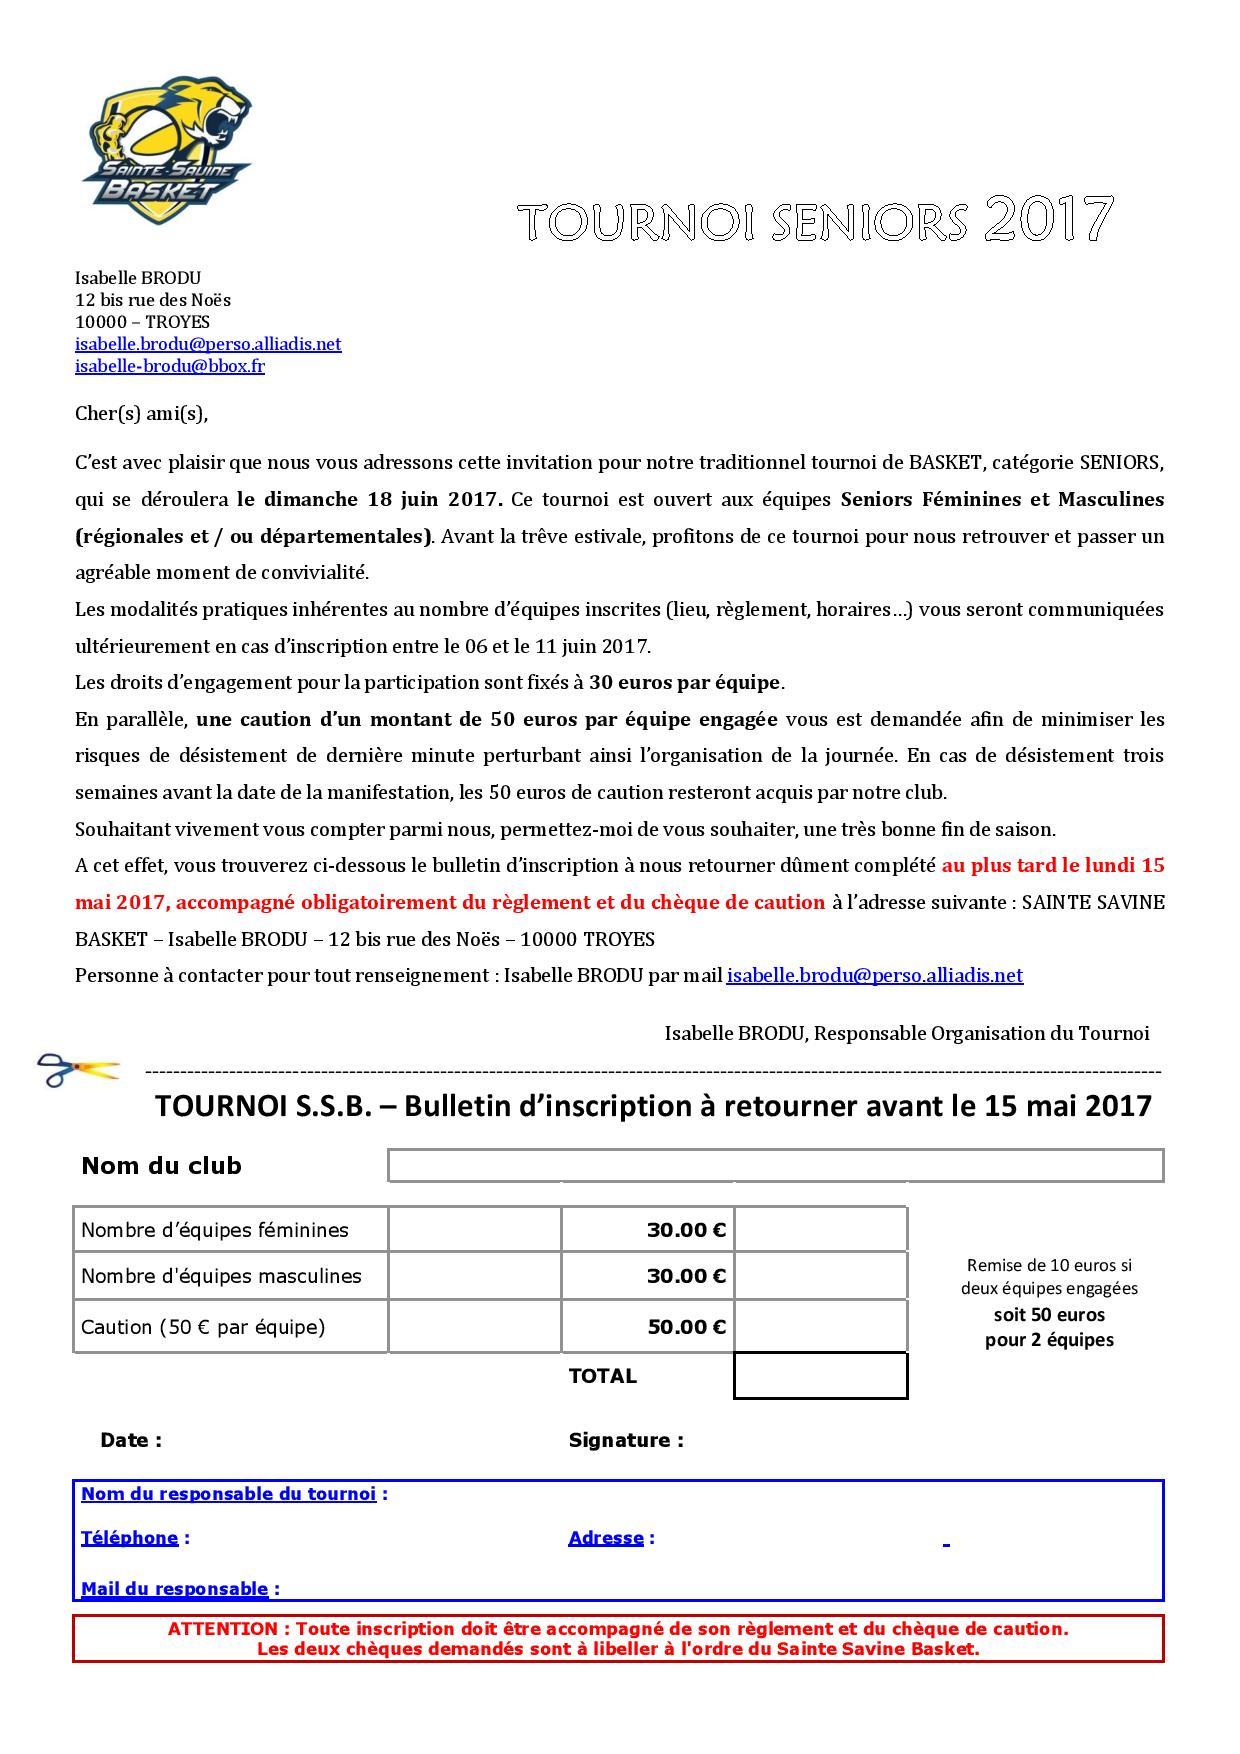 Invitation Tournoi Seniors (18 juin 2017)-page-001